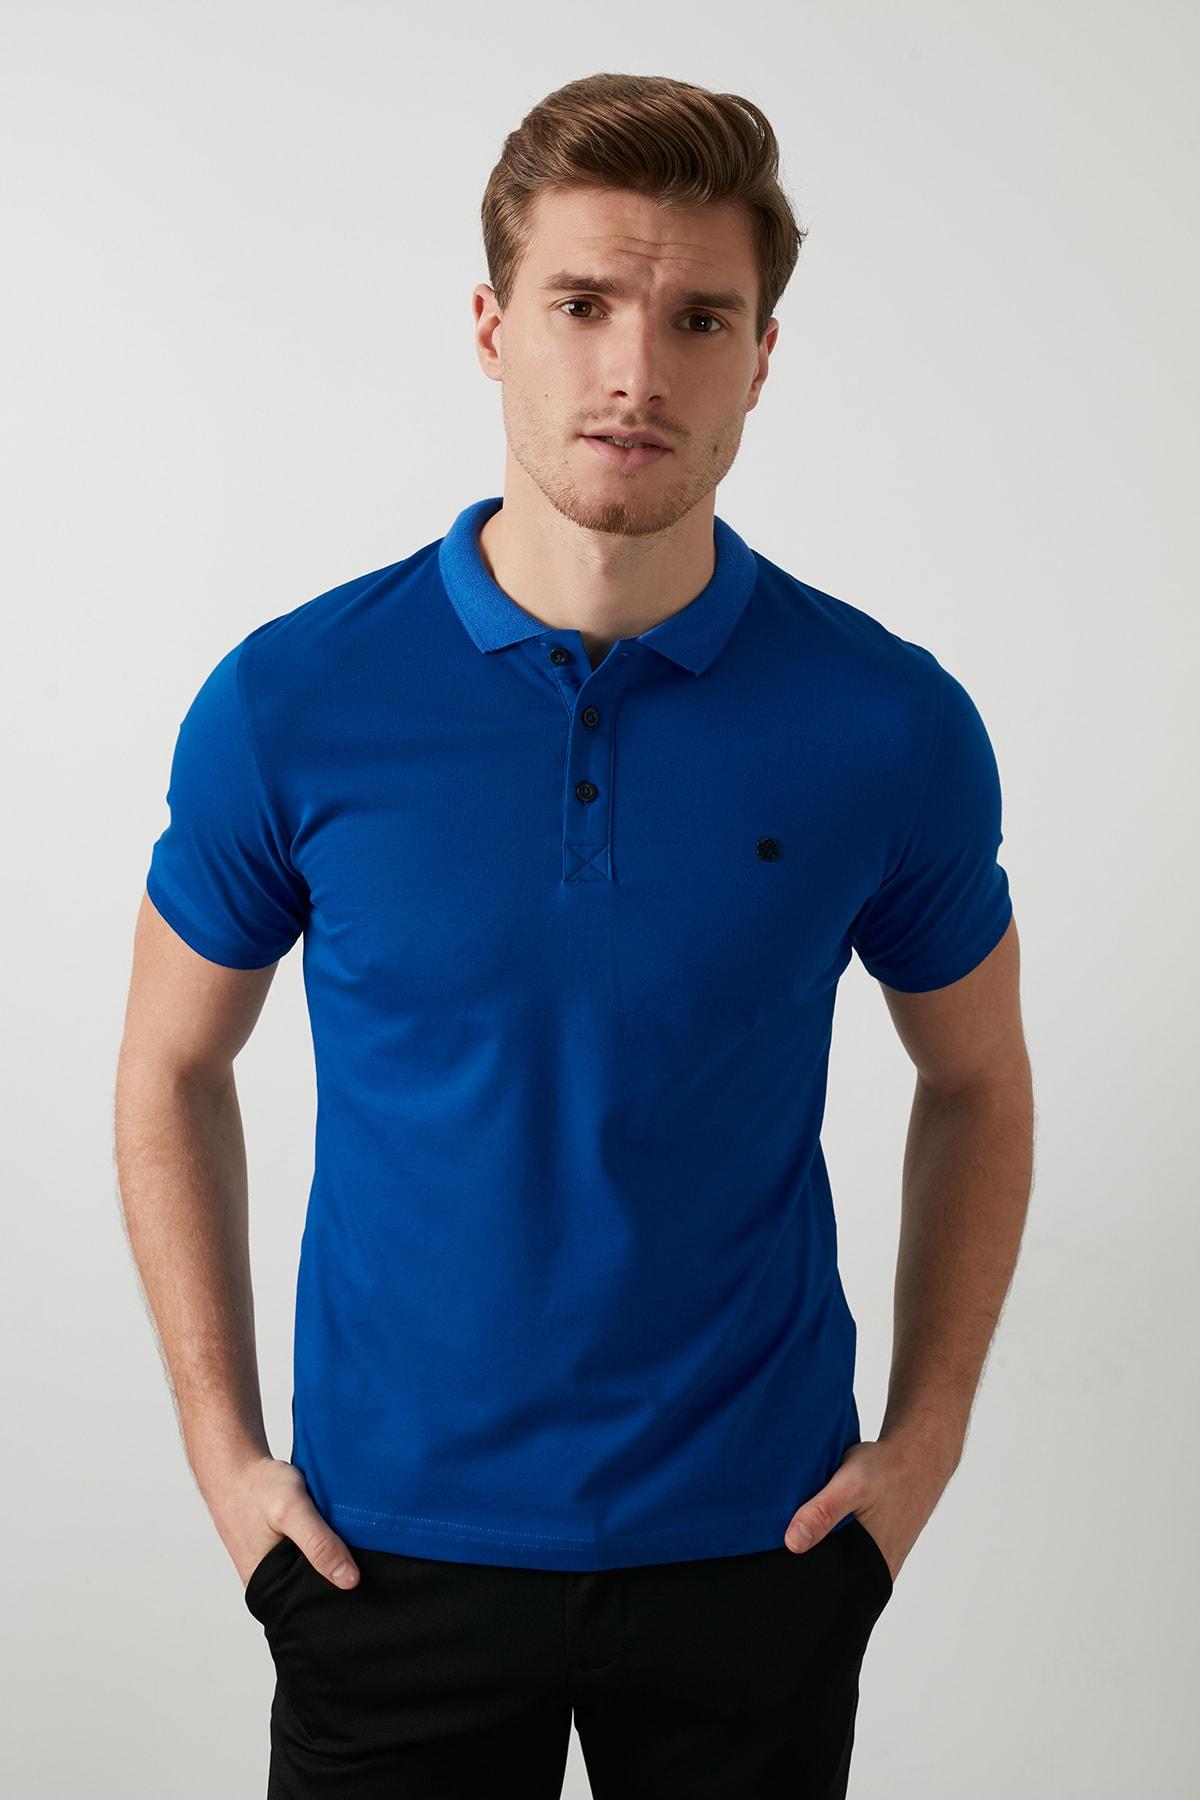 Buratti Erkek Parlıament Mavisi Düğmeli Polo Yaka Standart Fit Pamuklu T Shirt 0438101 1